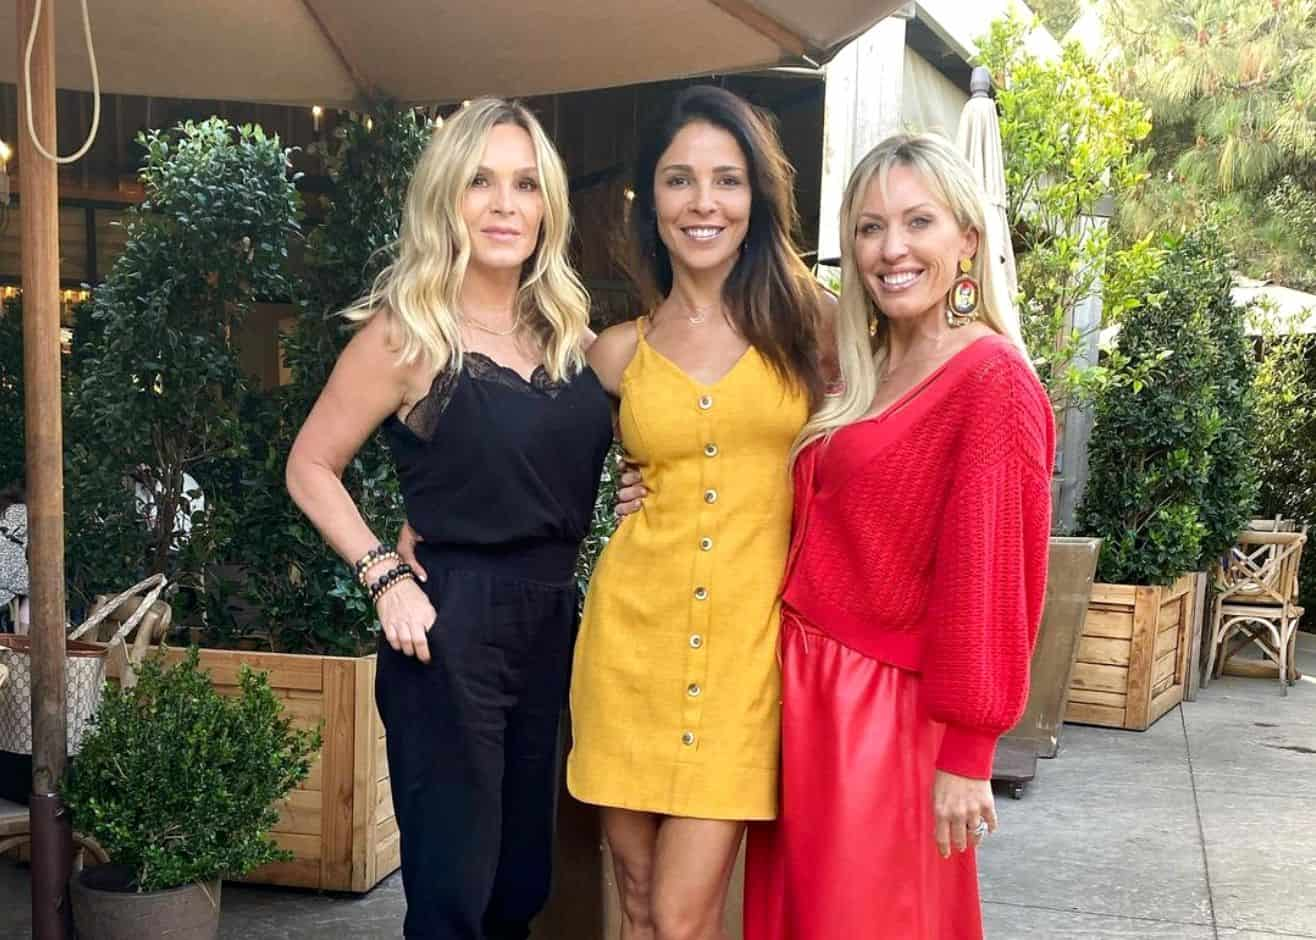 Is Braunwyn Windham-Burke Dating Ex RHOC Star Fernanda Rocha? Tamra Judge Speaks Out, Plus Braunwyn Splits From Girlfriend Kris After Just Months of Dating